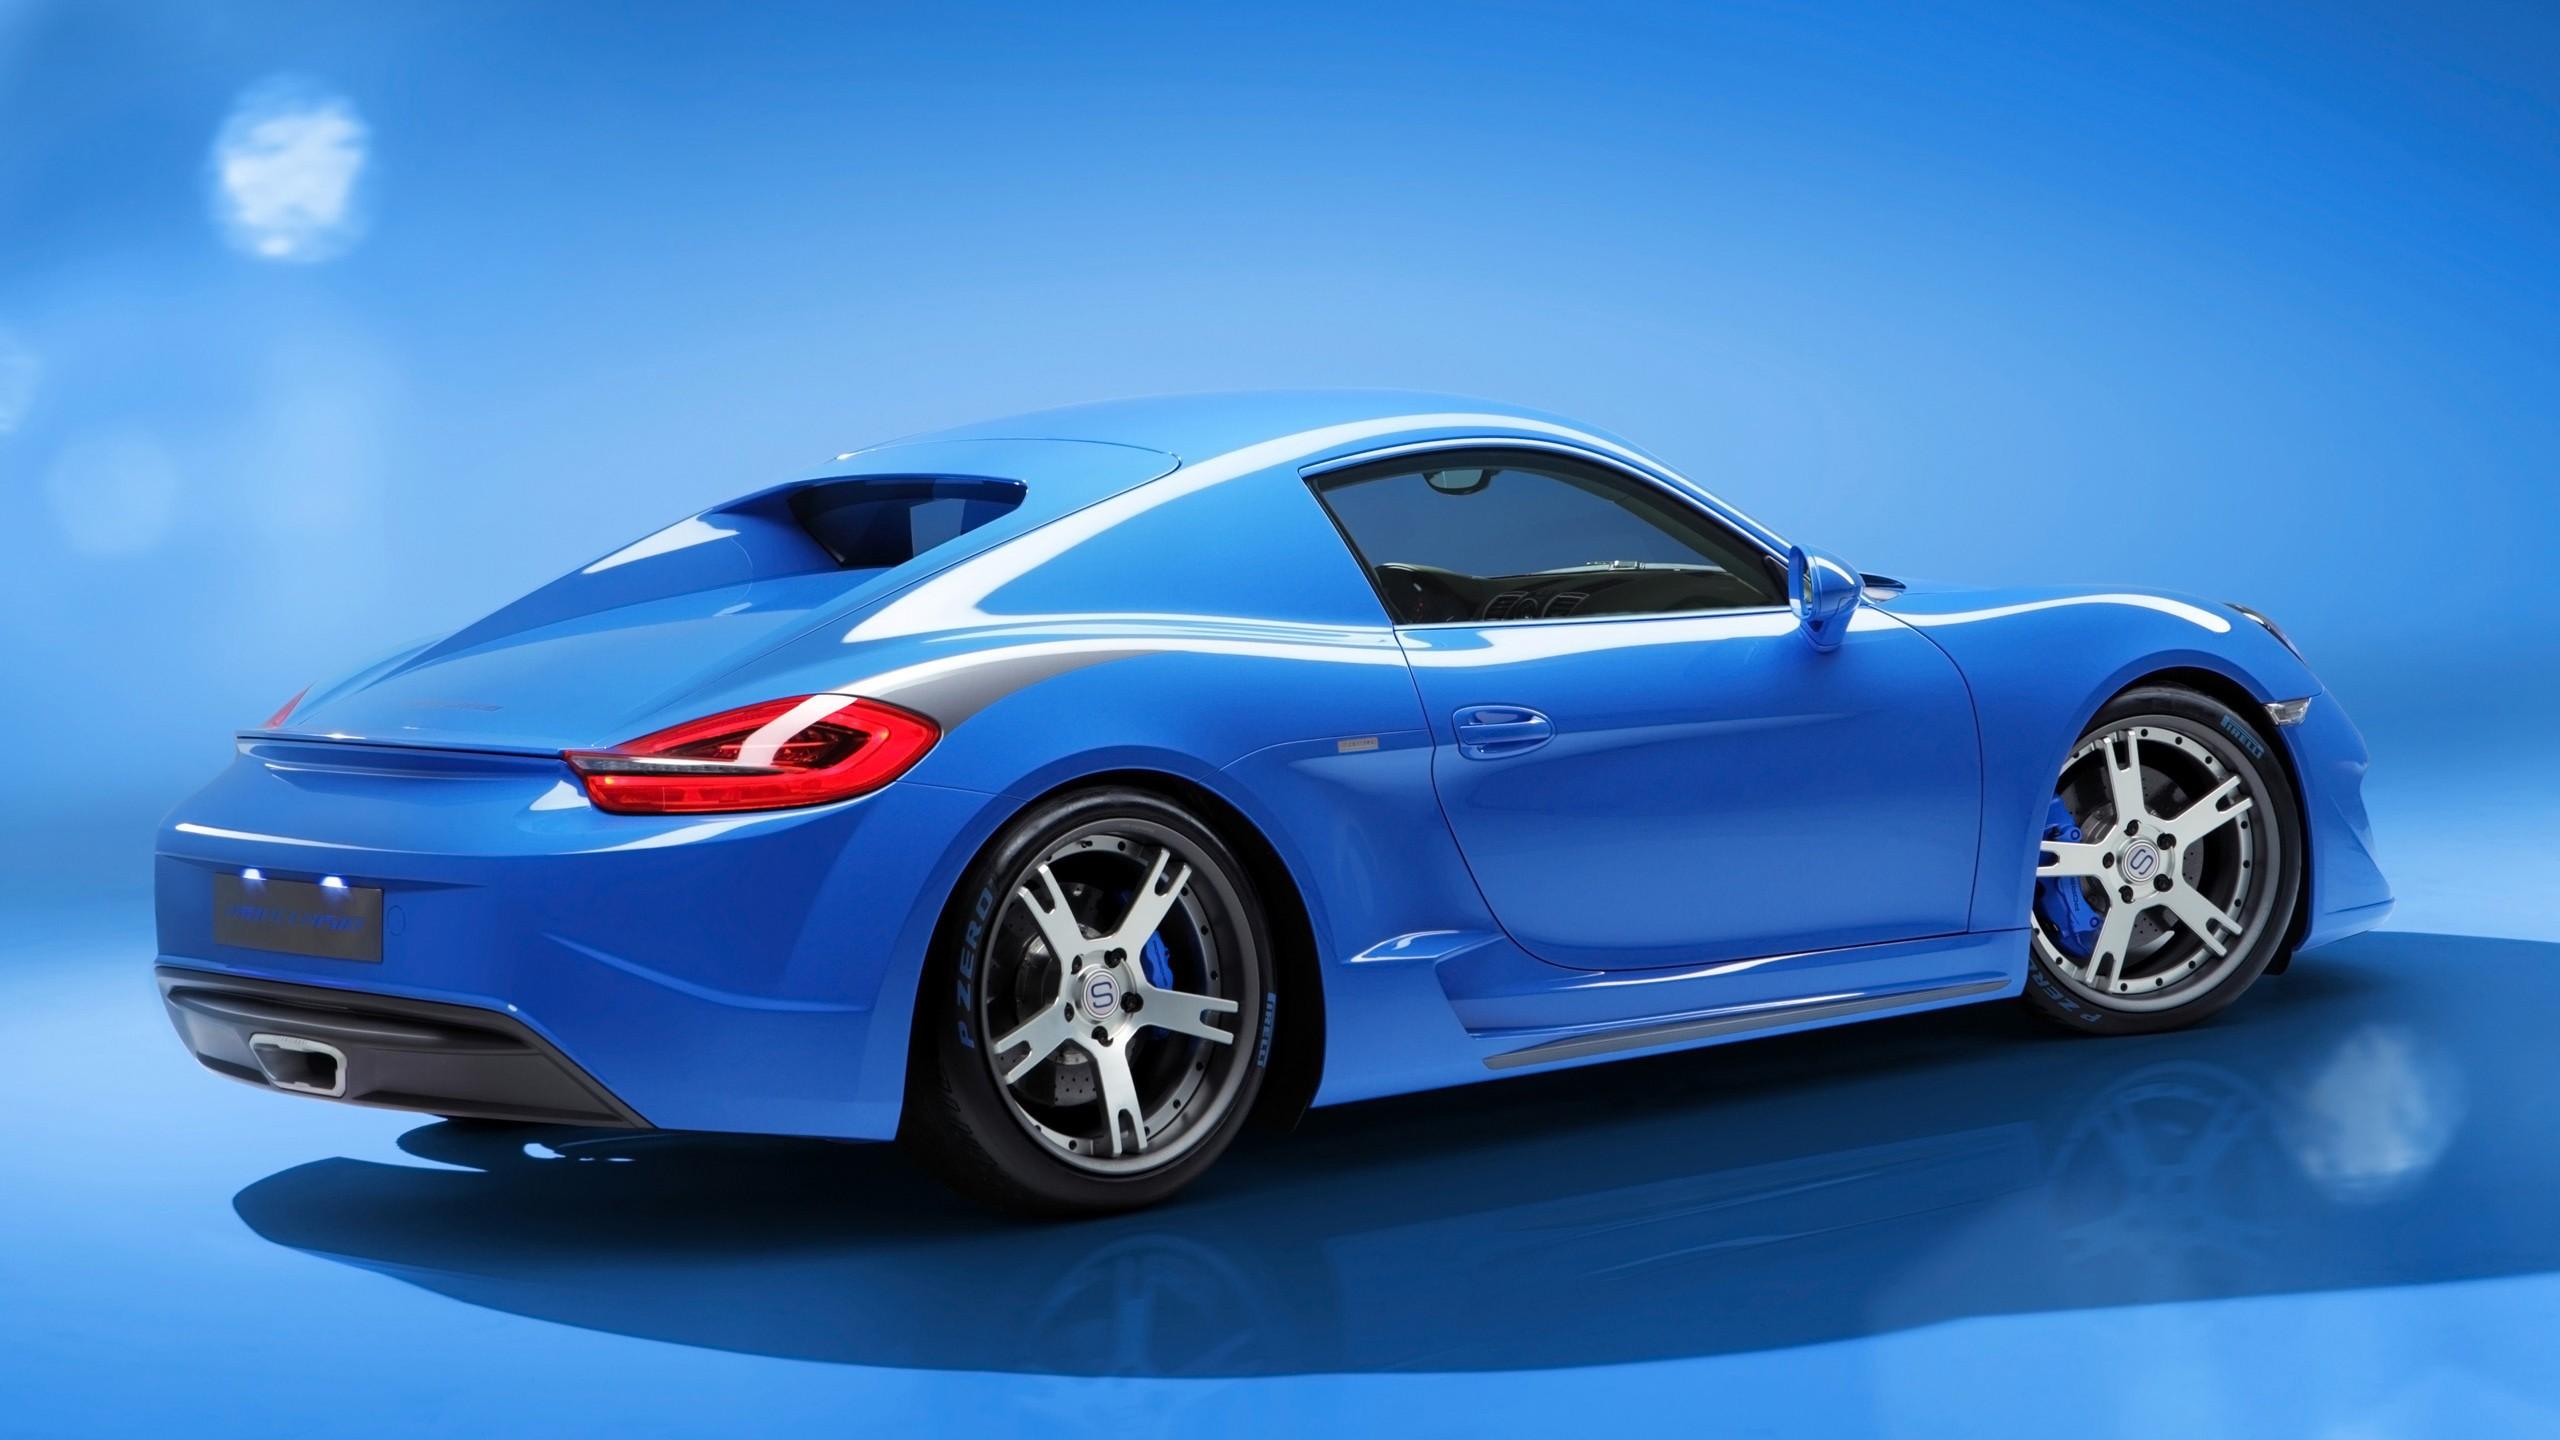 2014 Studiotorino Porsche Cayman Moncenisio Blue 3